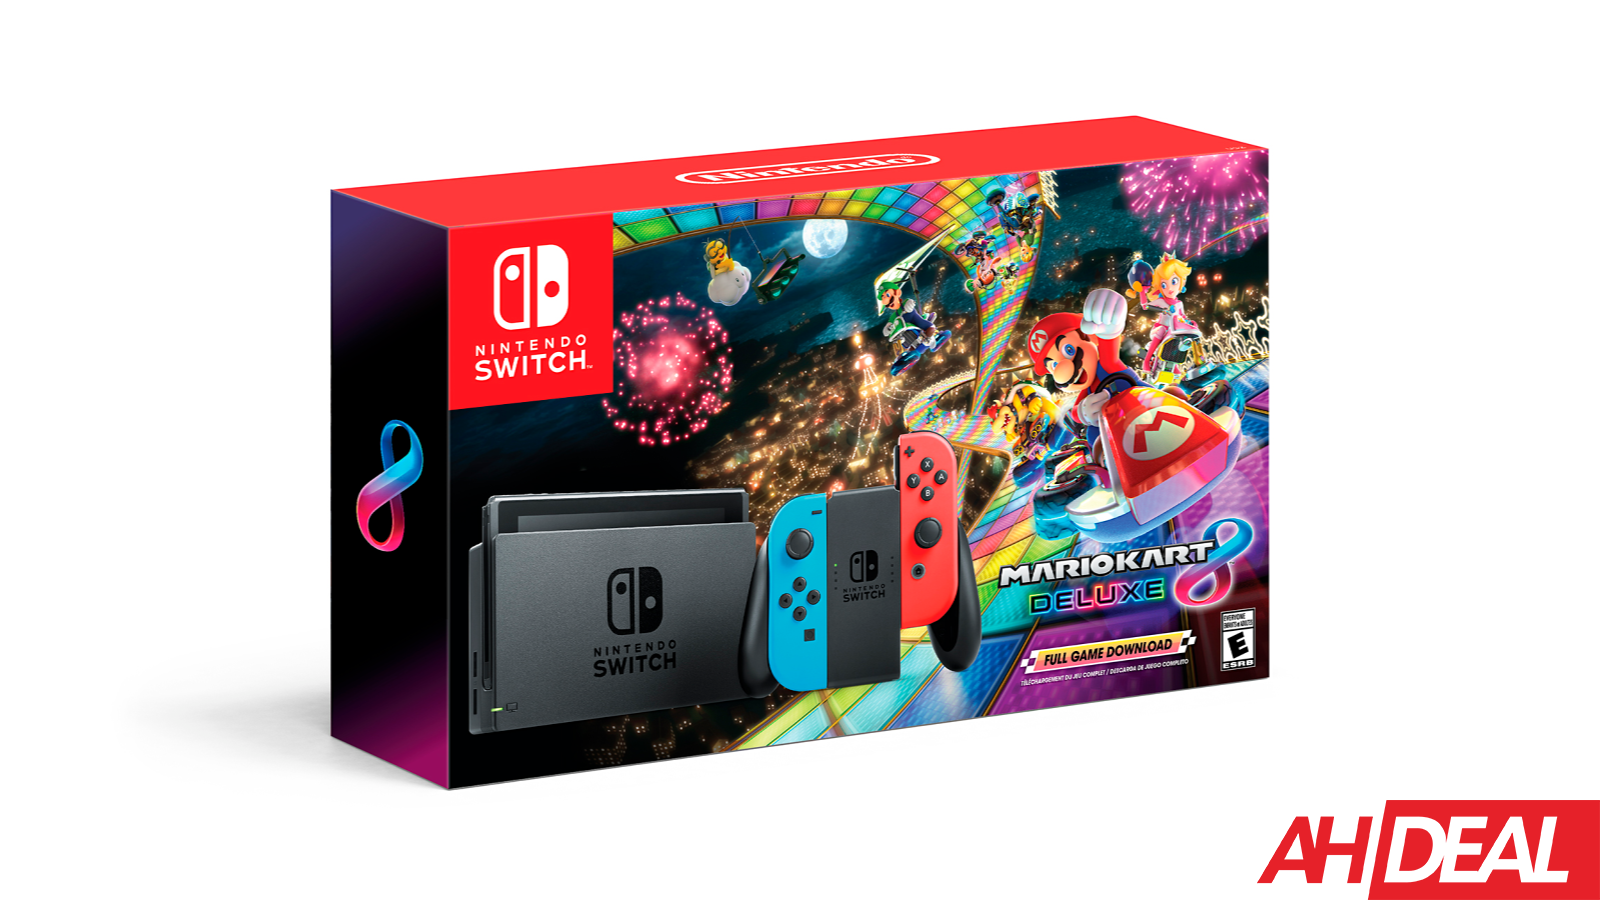 Nintendo Switch With Mario Kart 8 Deluxe 299 Walmart Black Friday 2018 Deals Buy Nintendo Switch Nintendo Switch System